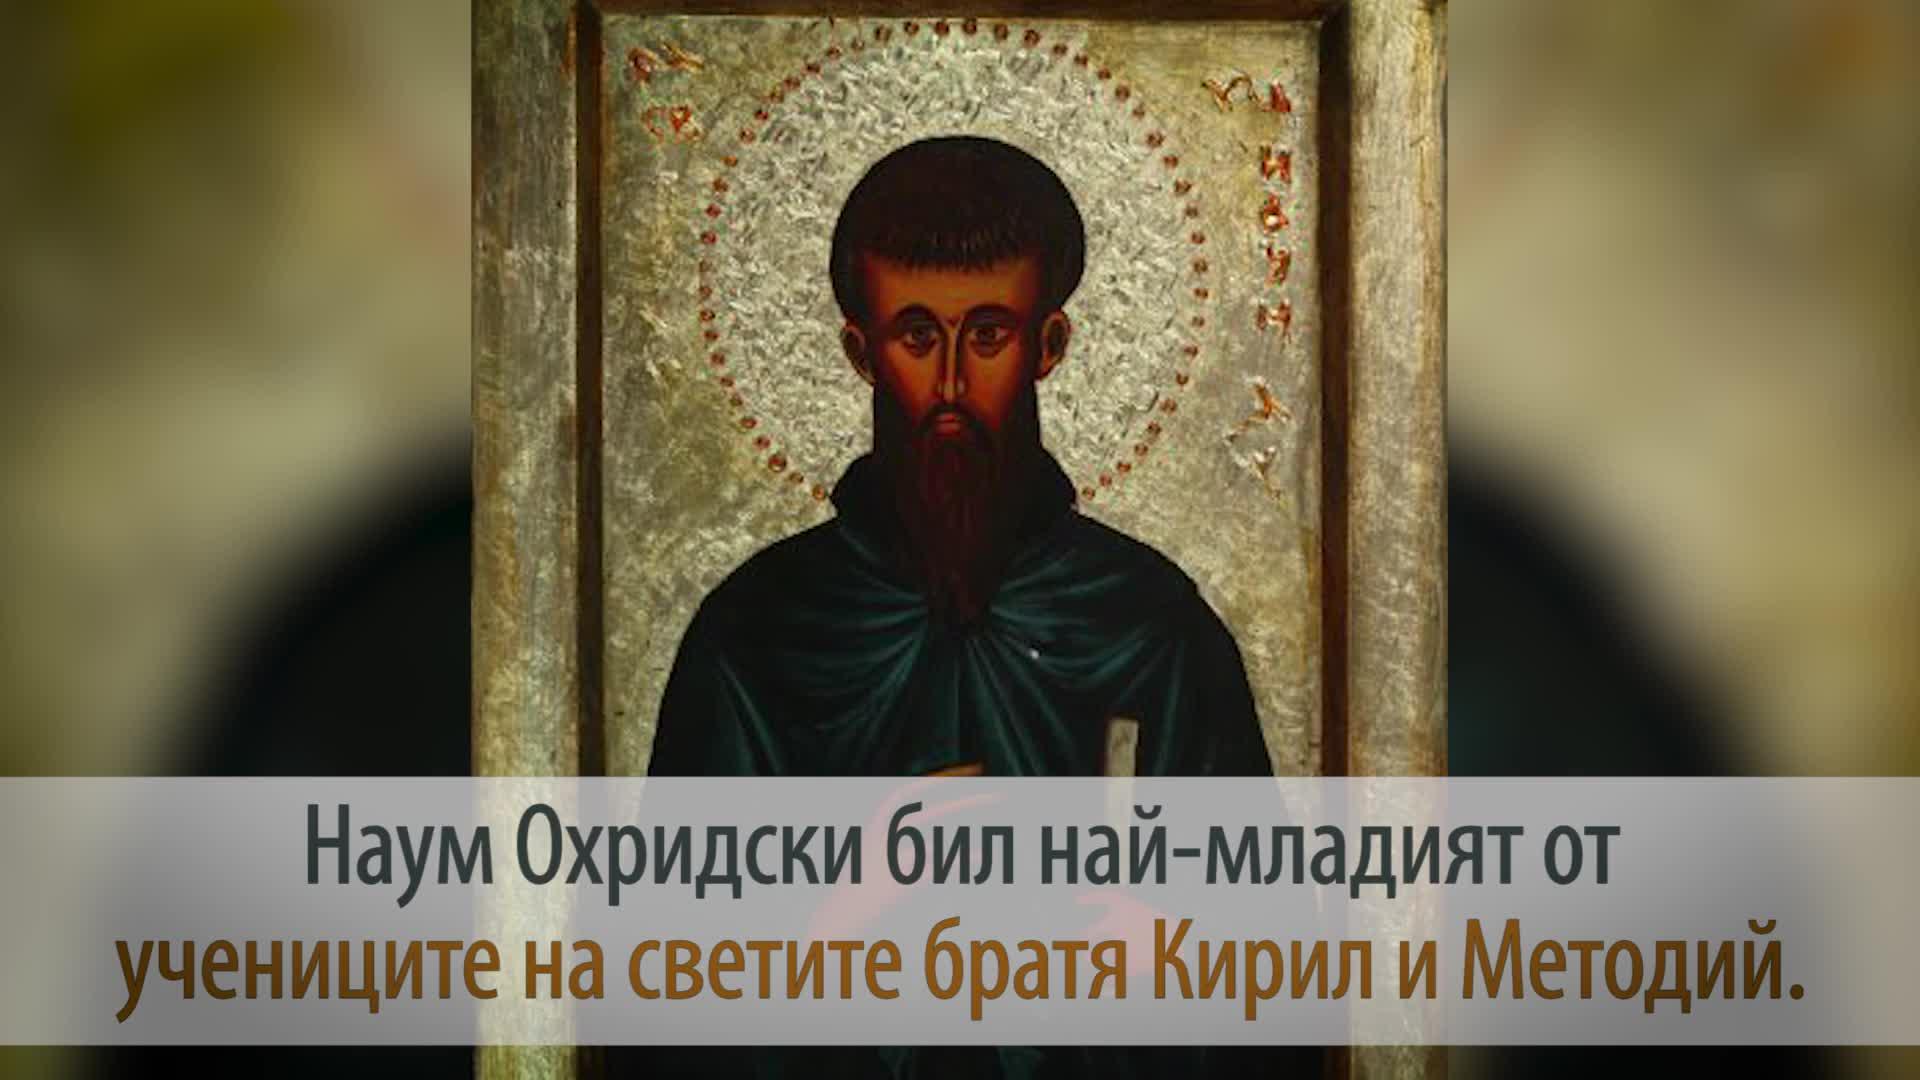 23 Декември - Преподобни Наум Охридски